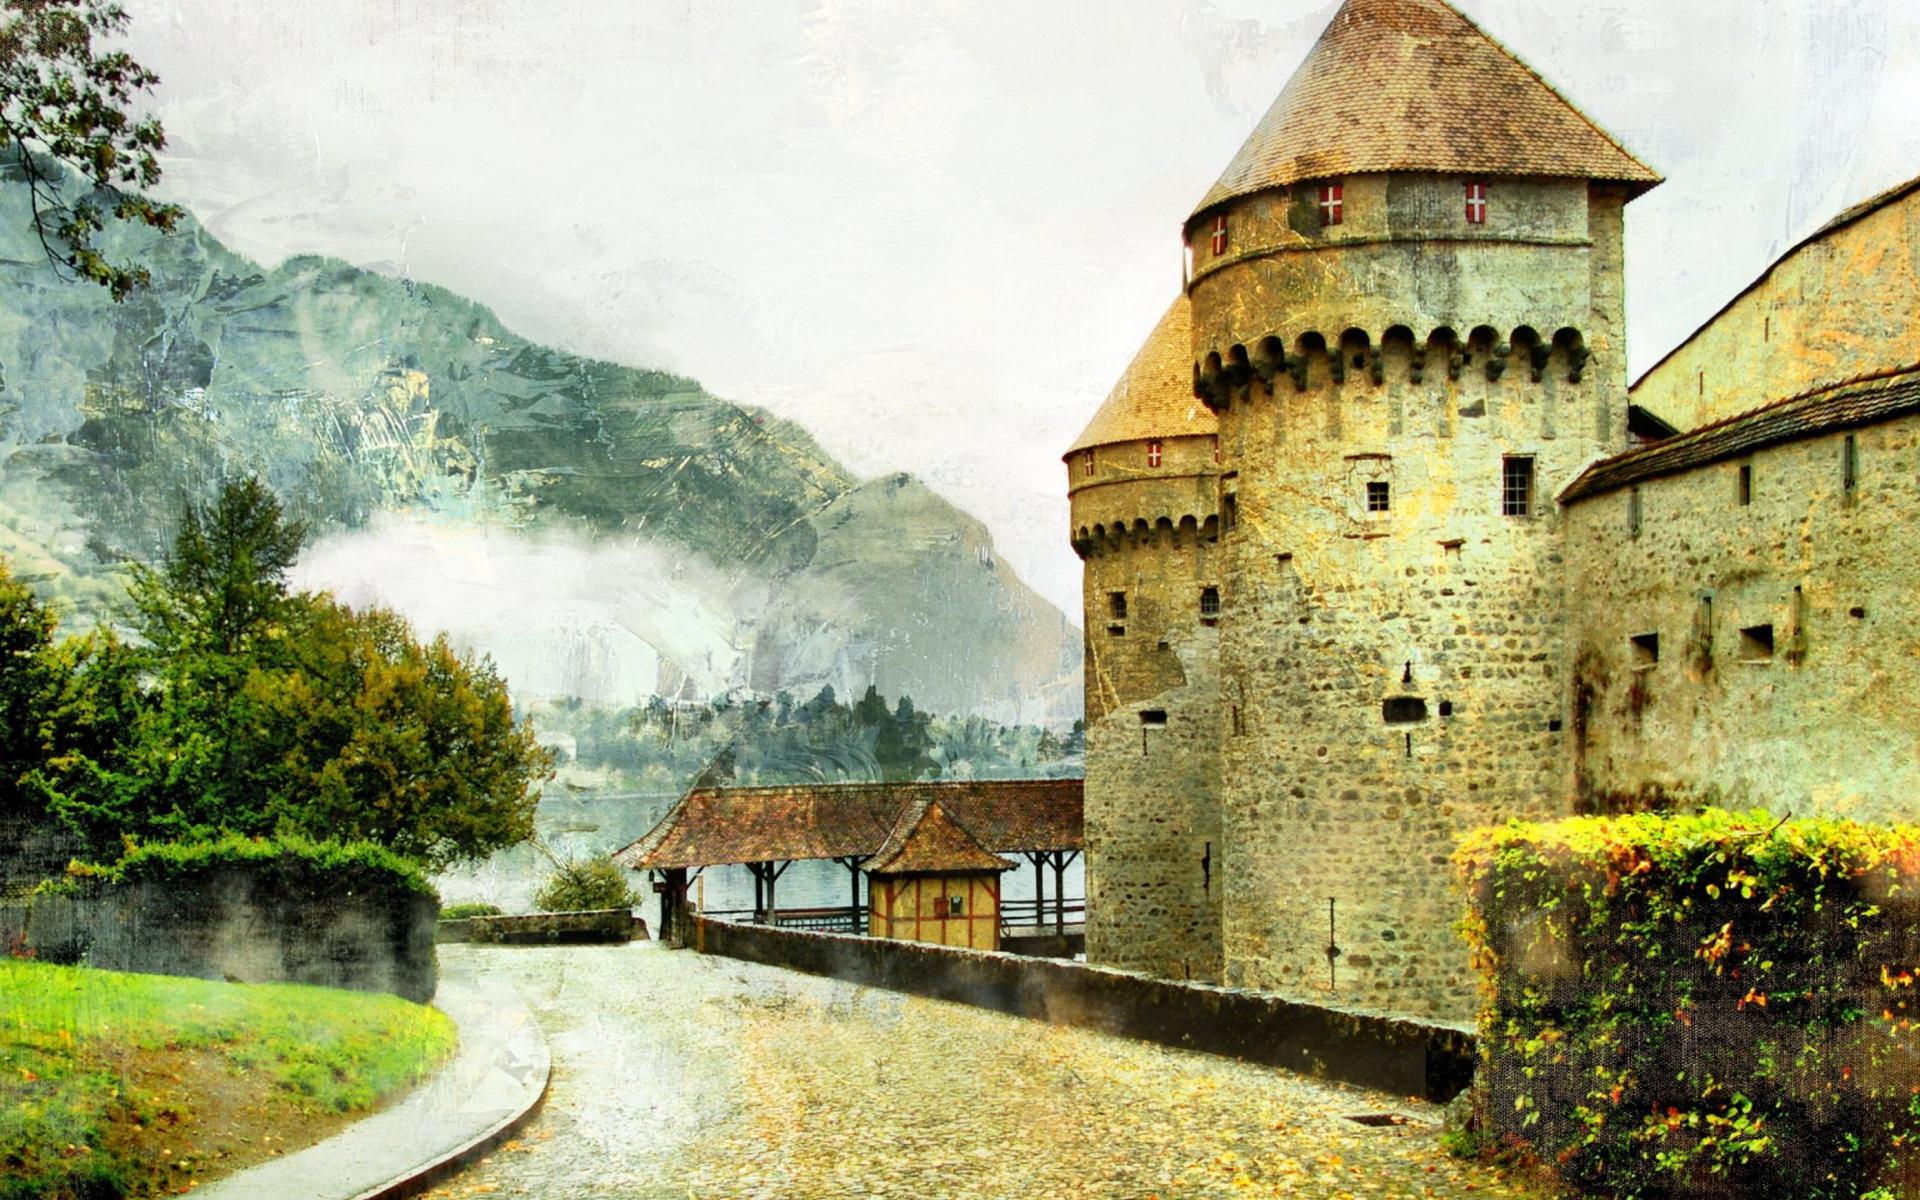 Chillon Castle in Montreux para Widescreen Desktop PC 1920x1080 Full HD